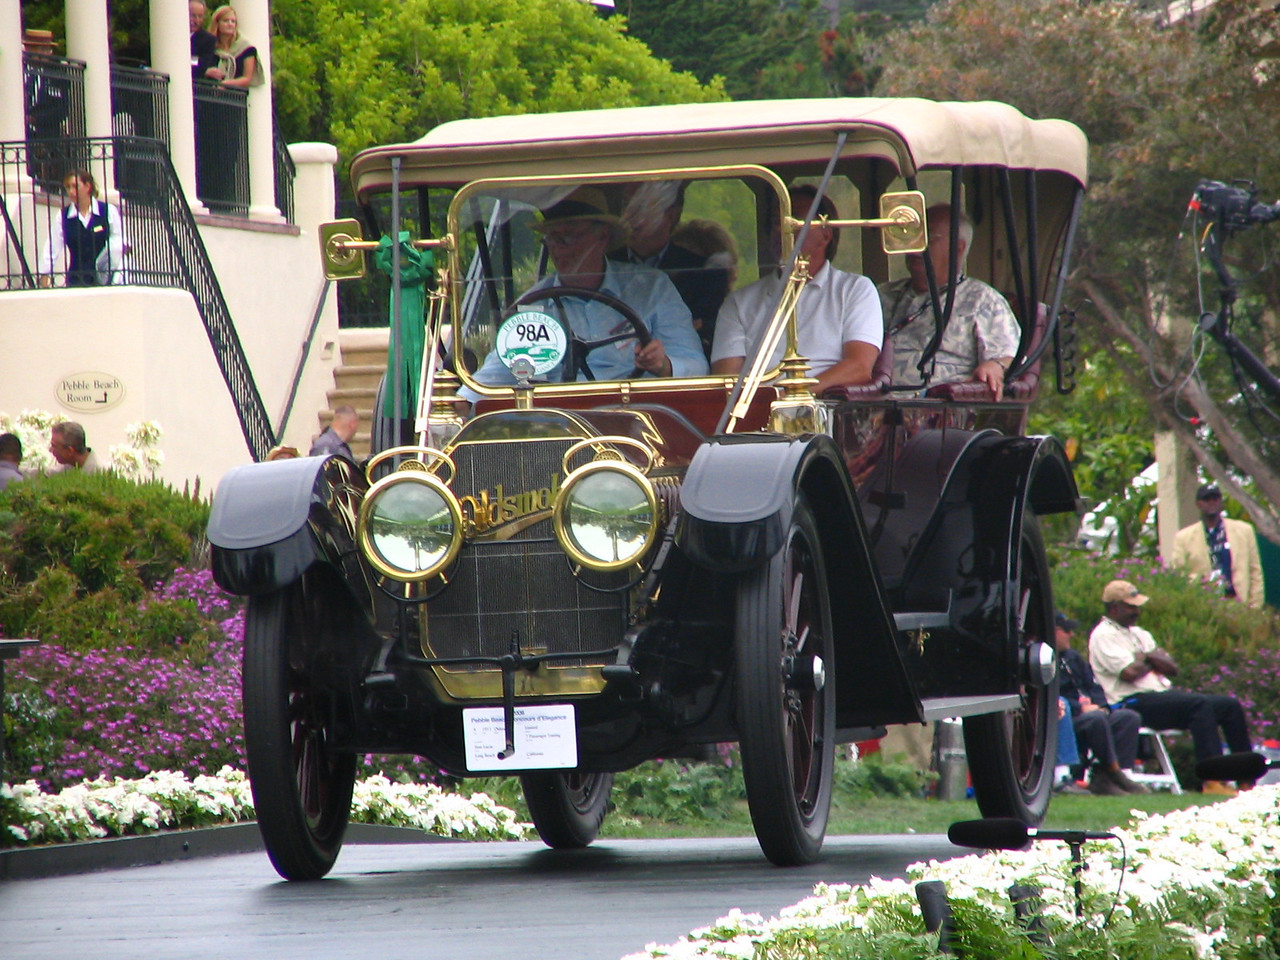 Ansel Adams Trophy Winner -- 1911 Oldsmobile Limited 7 Passenger Touring